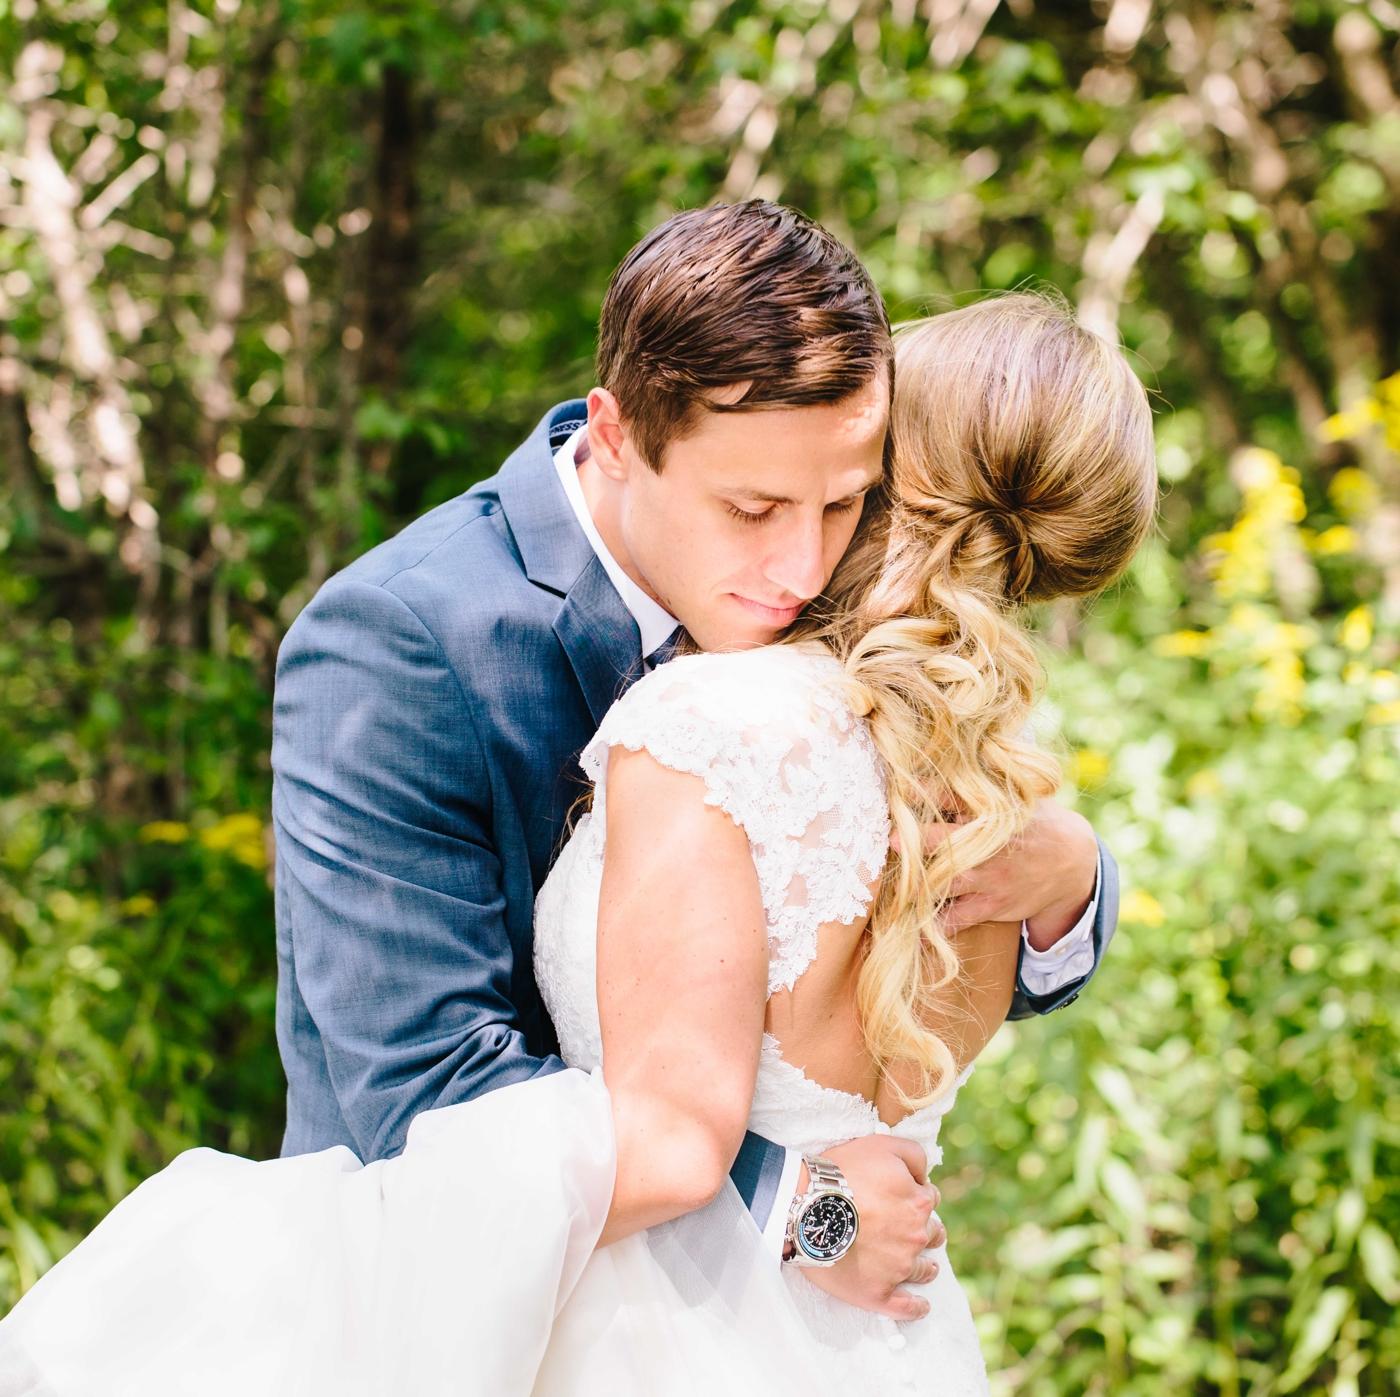 chicago-fine-art-wedding-photography-chiapetta15